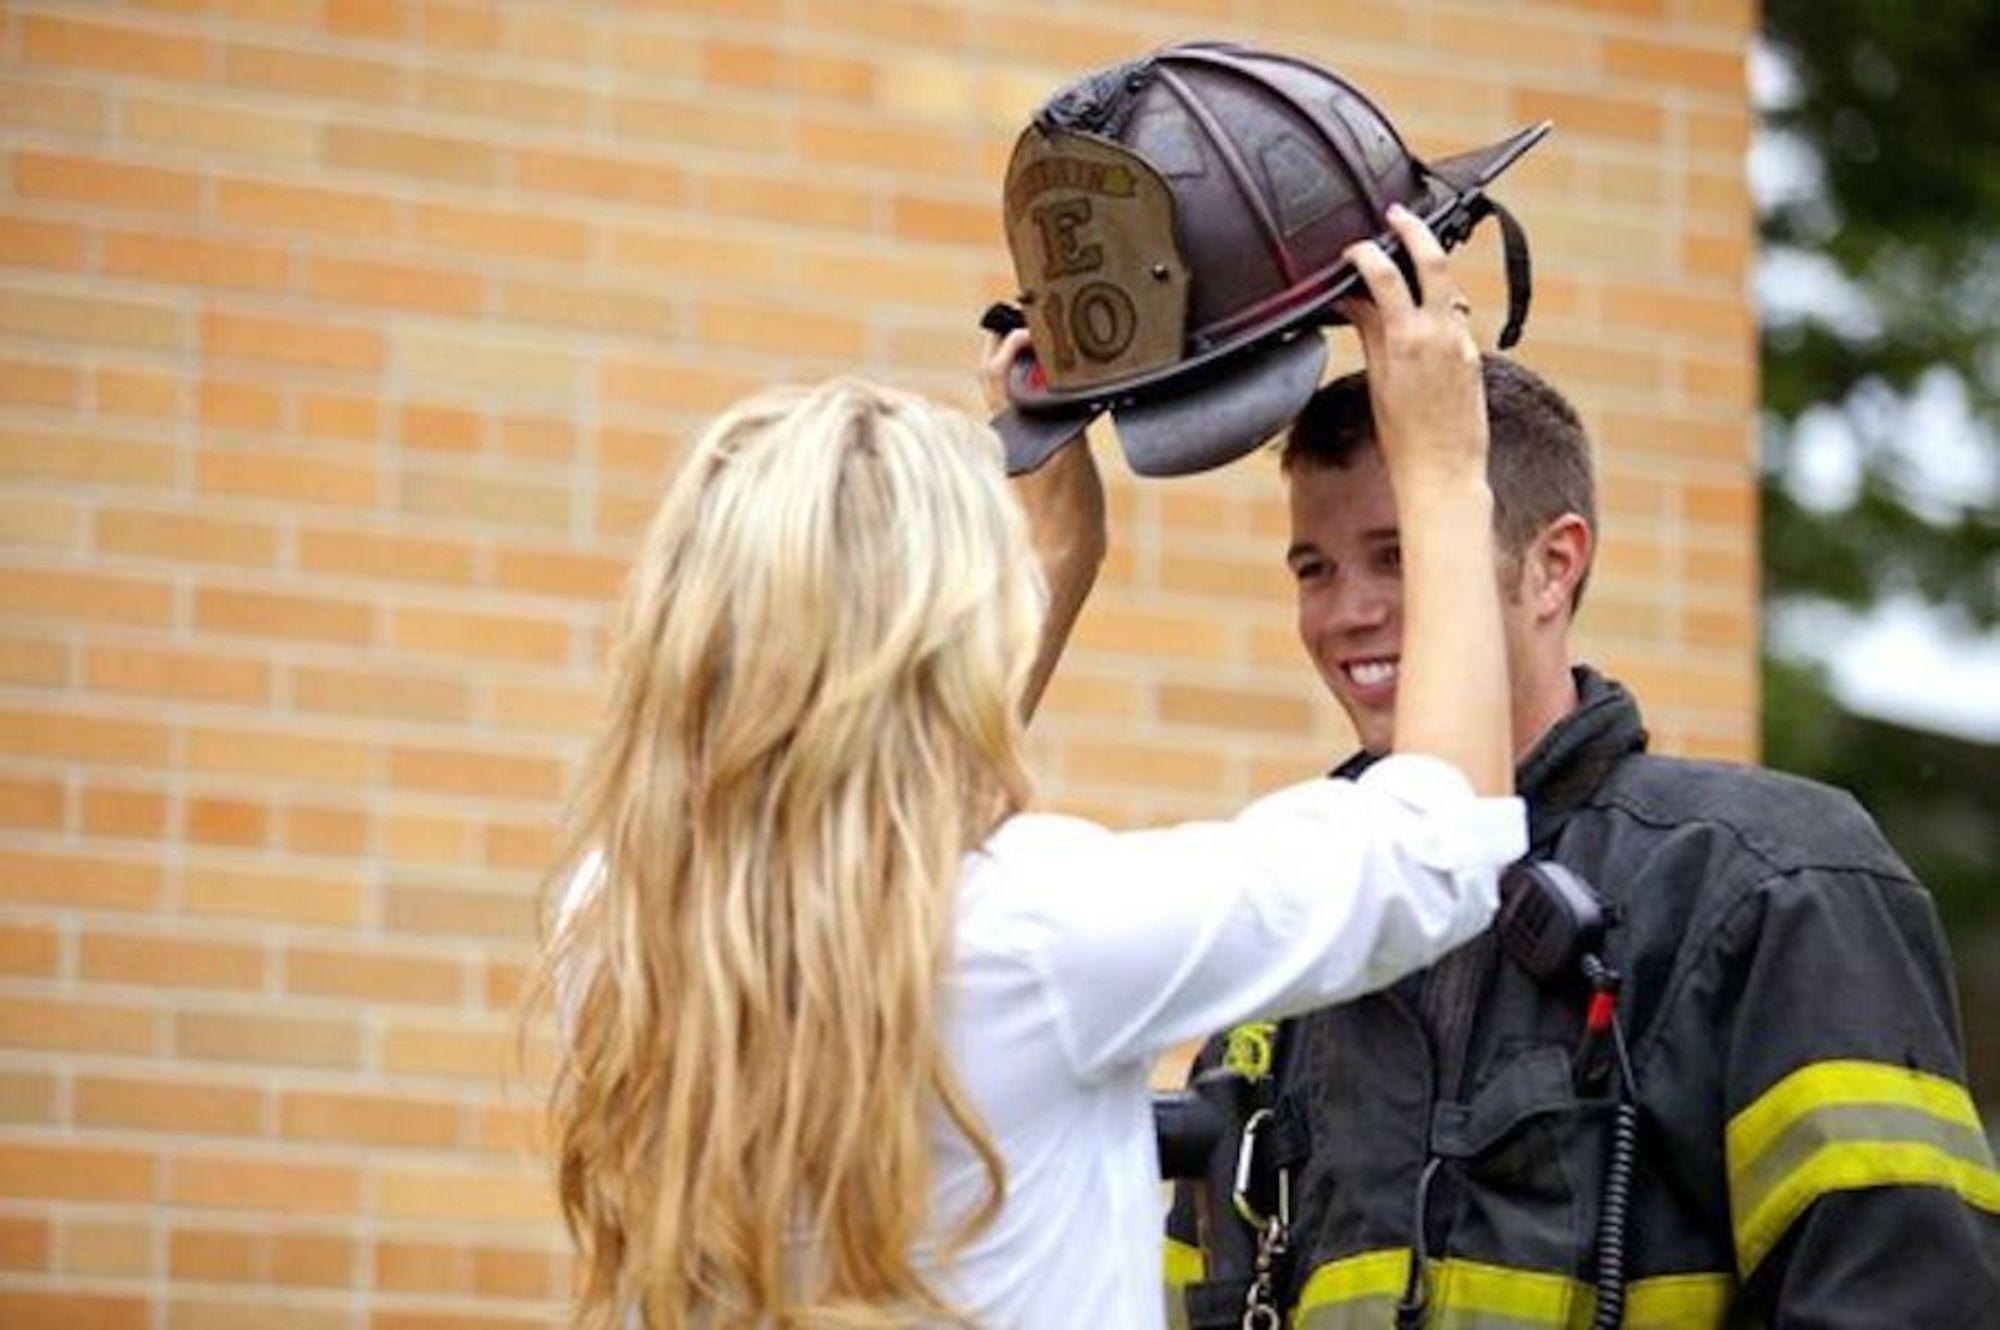 Fireman dating sivusto